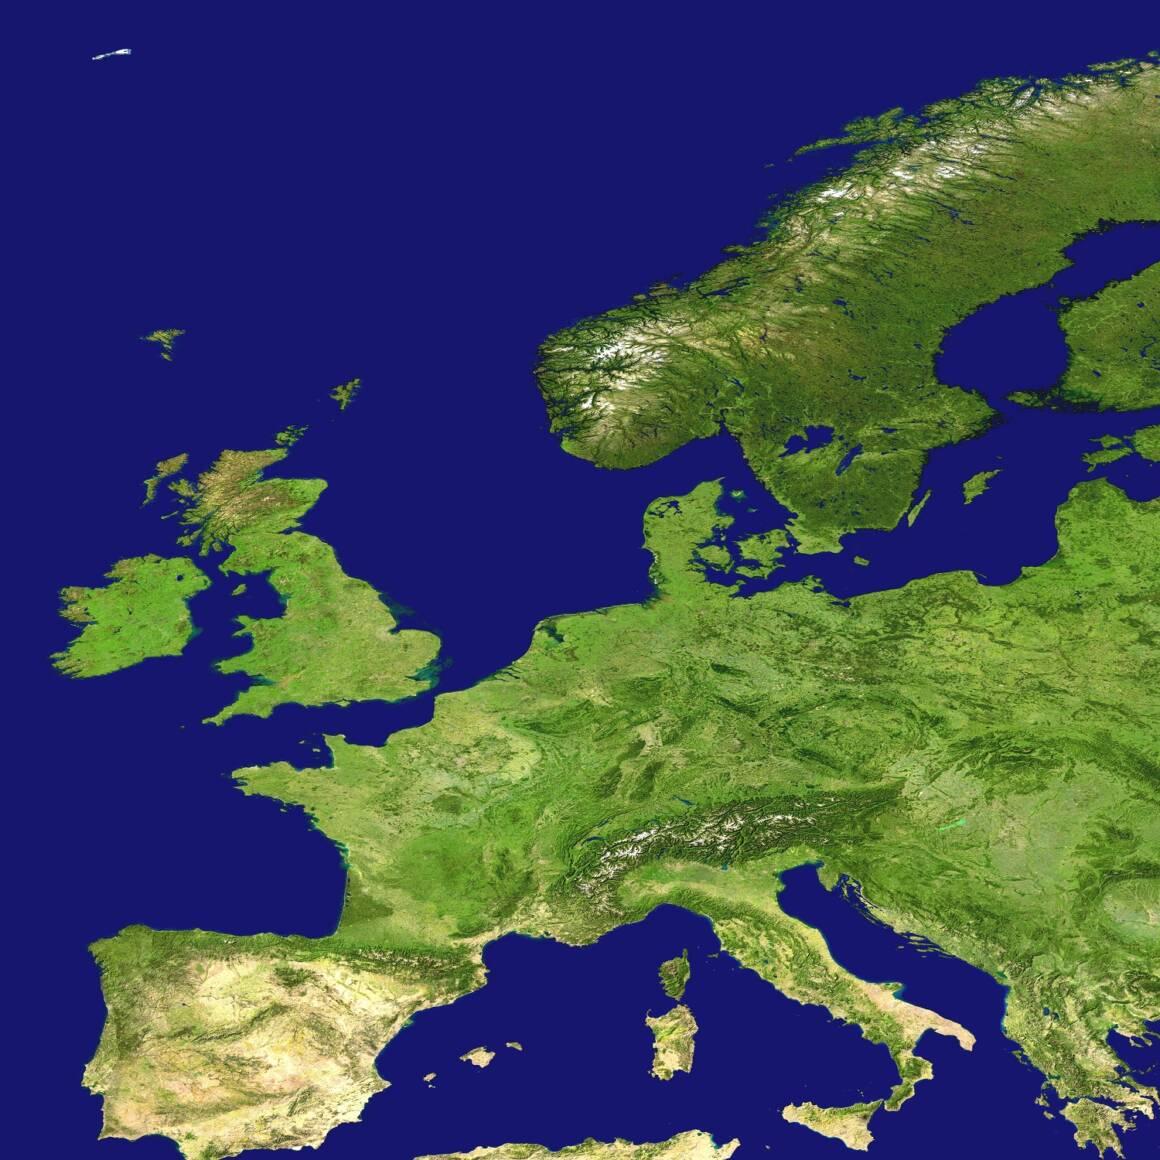 usgs inNzGtPrkHk unsplash 1160x1160 - TRENDIEST. I sobborghi cittadini più trendy in Europa